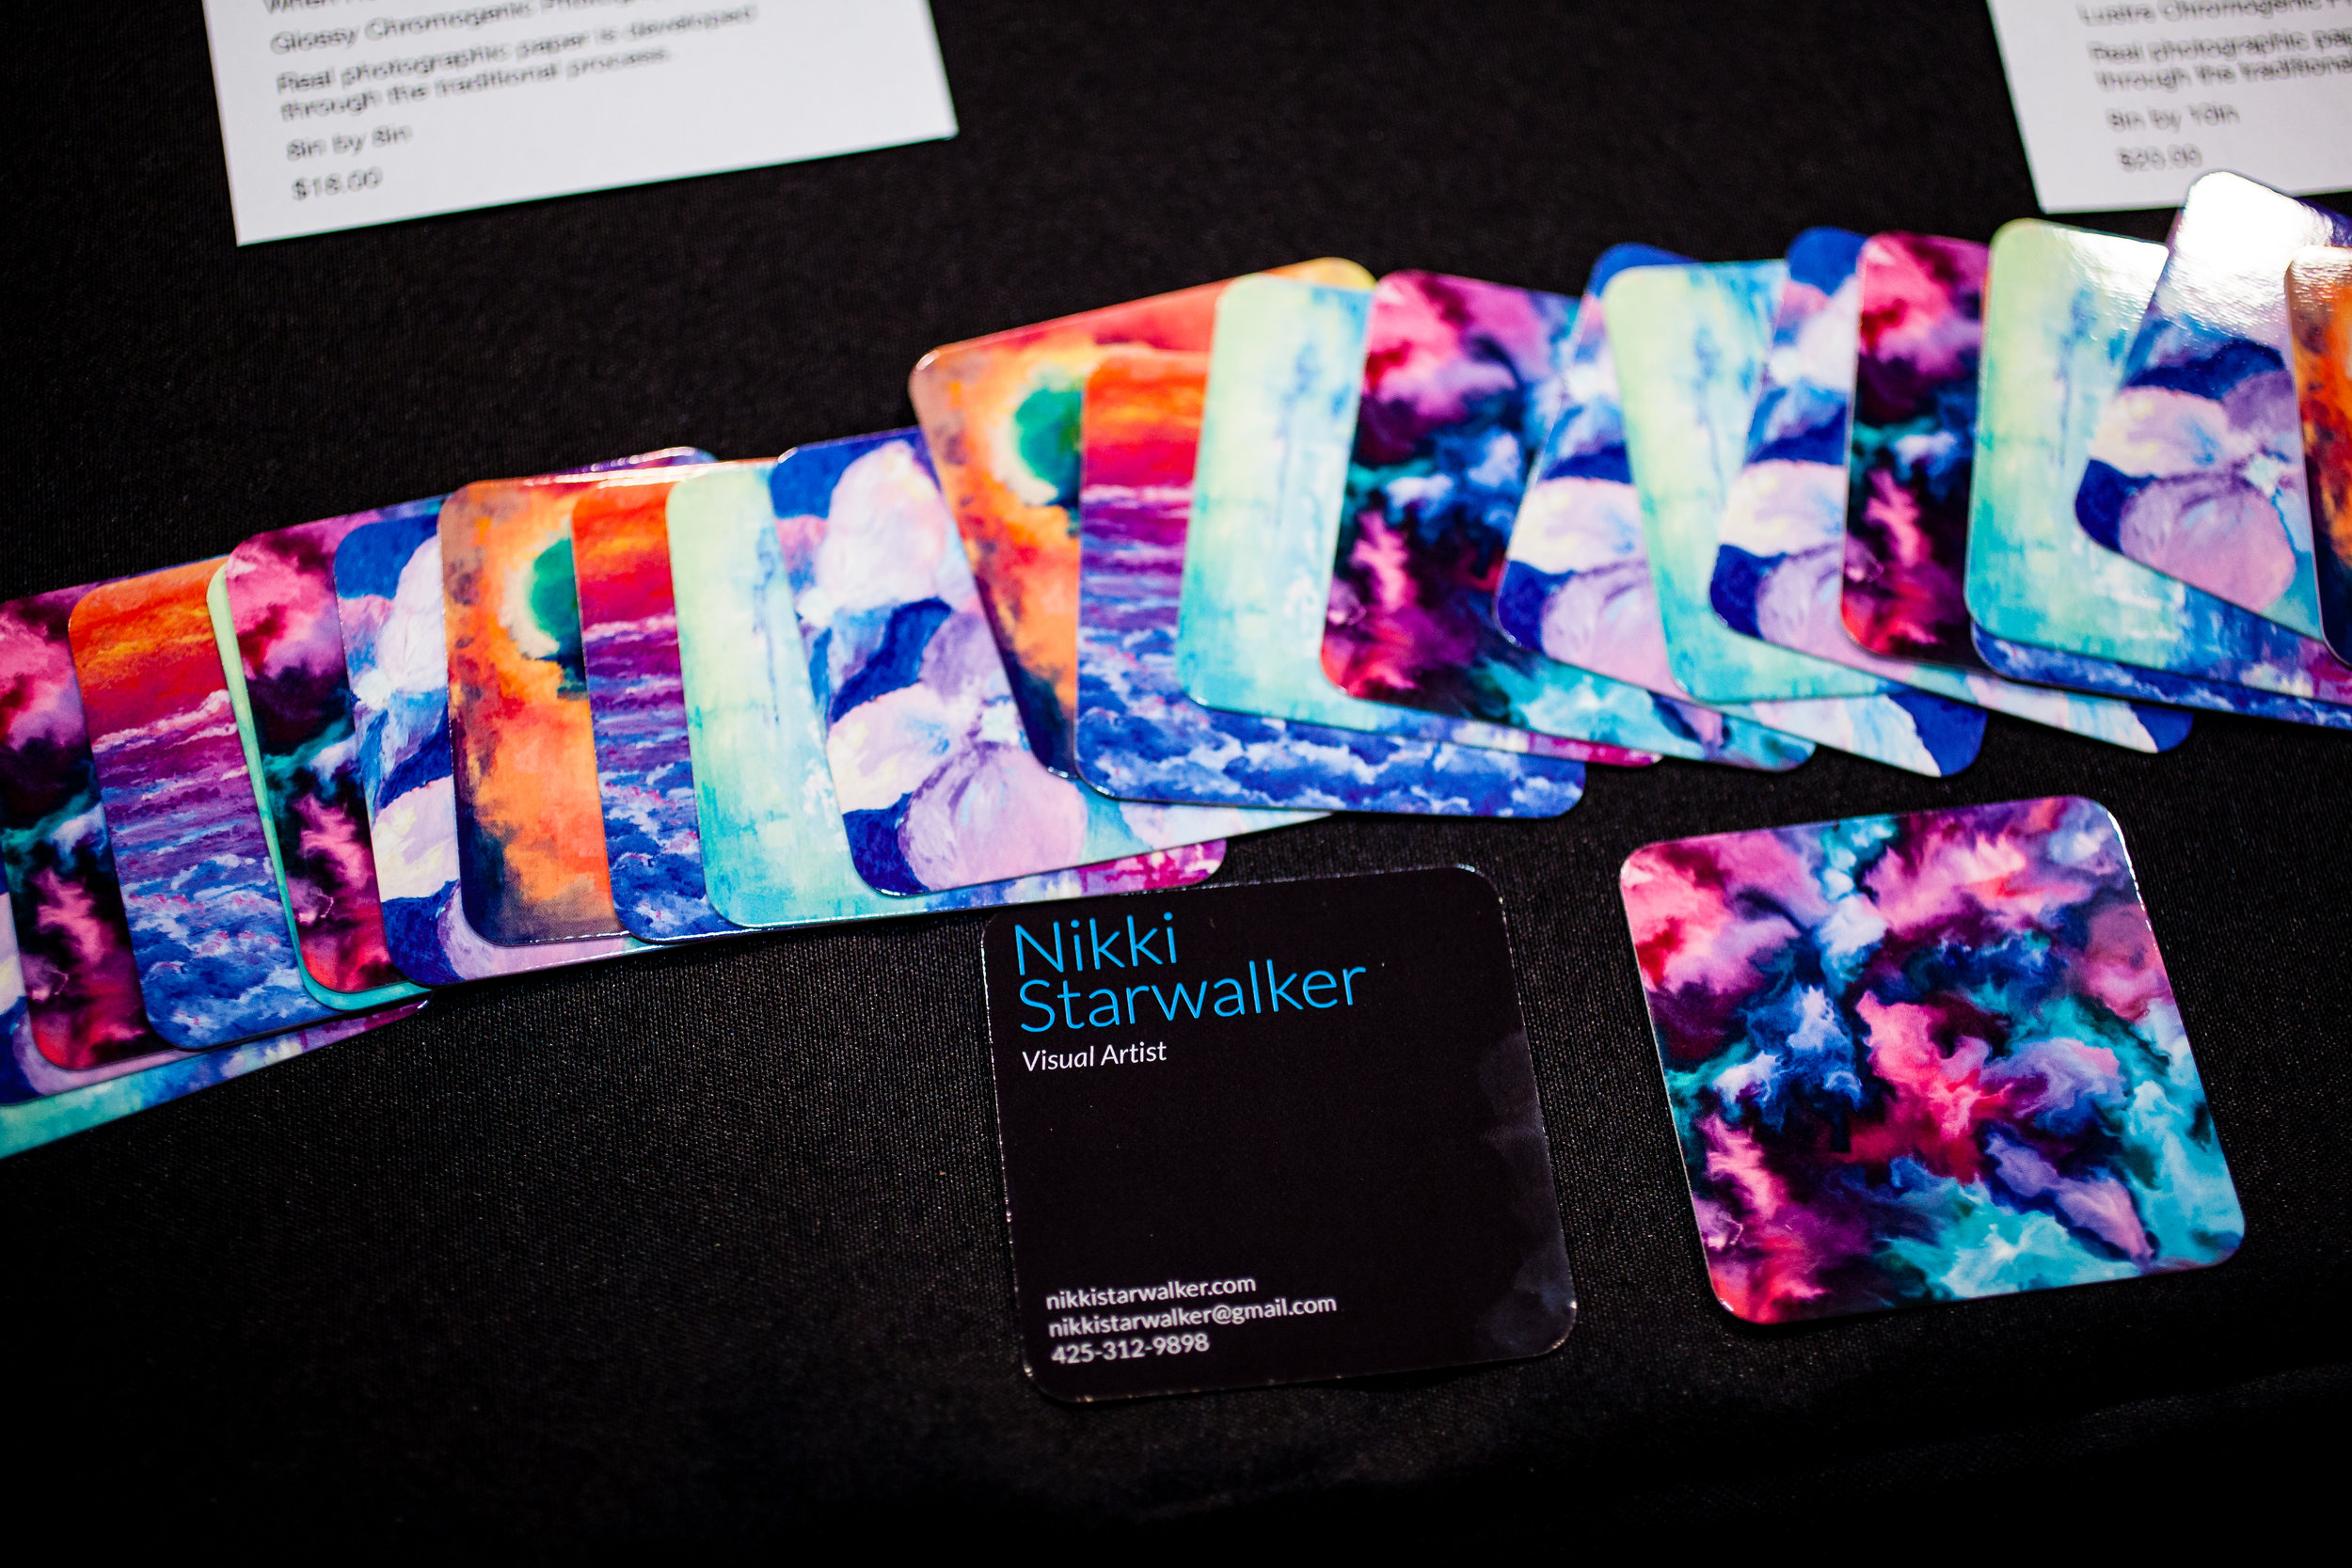 nikki-starwalker-business-cards.jpg